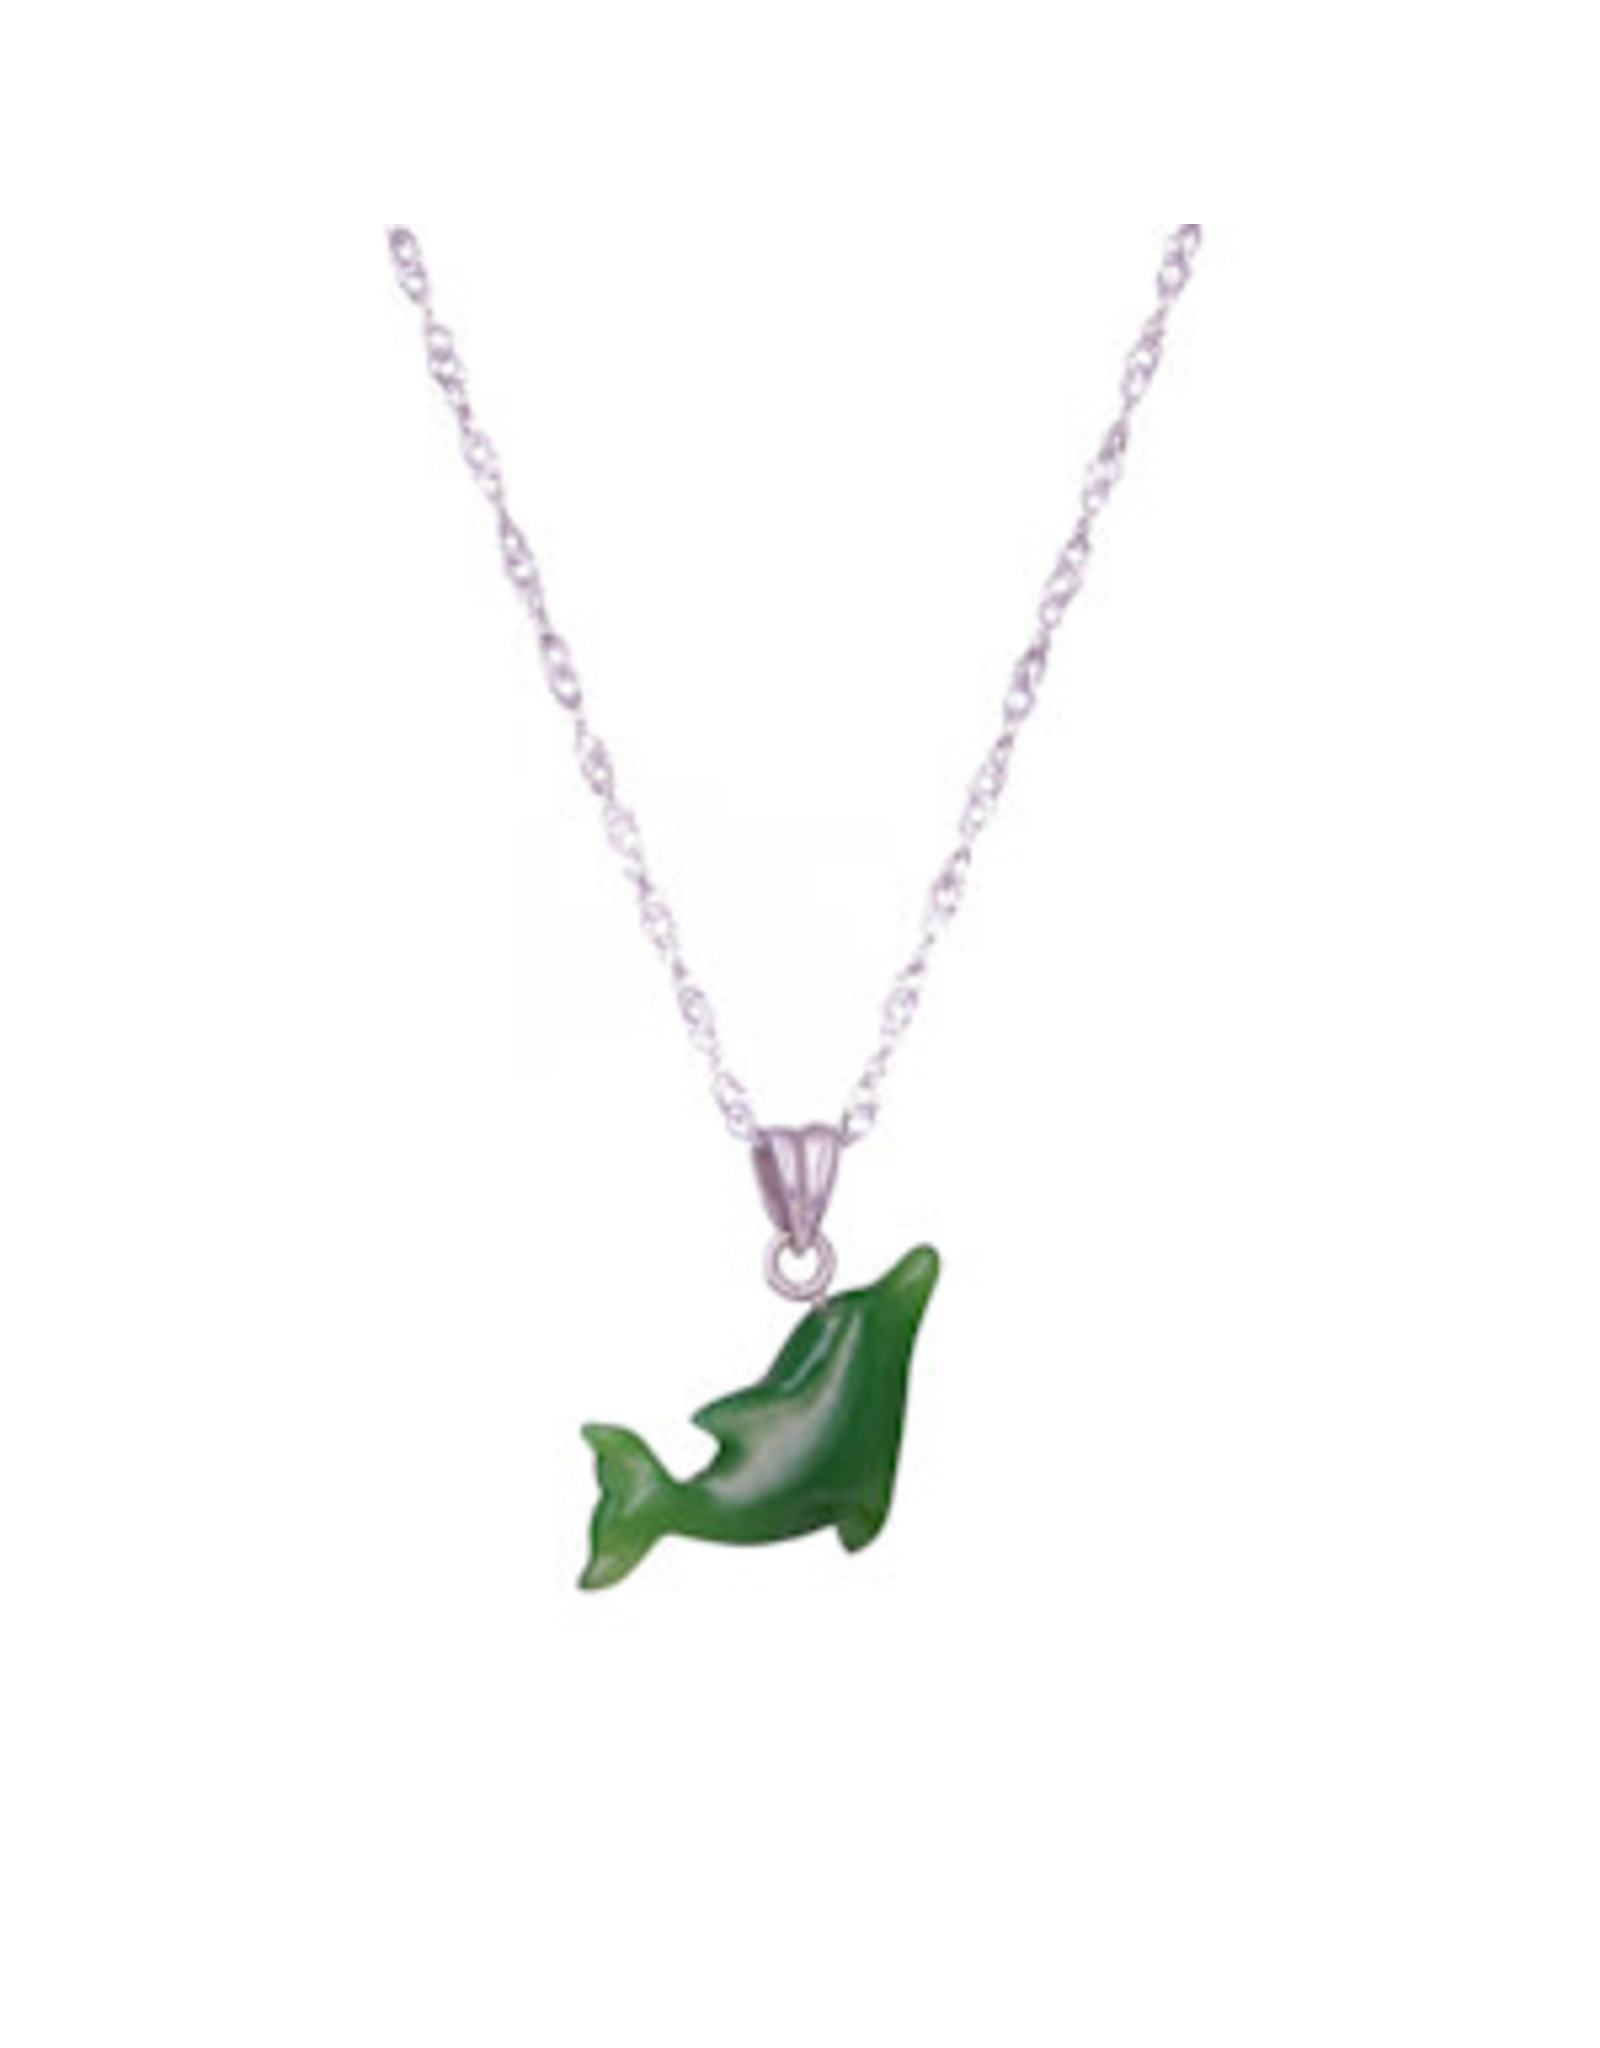 Jade Dolphin Necklace - JPS58